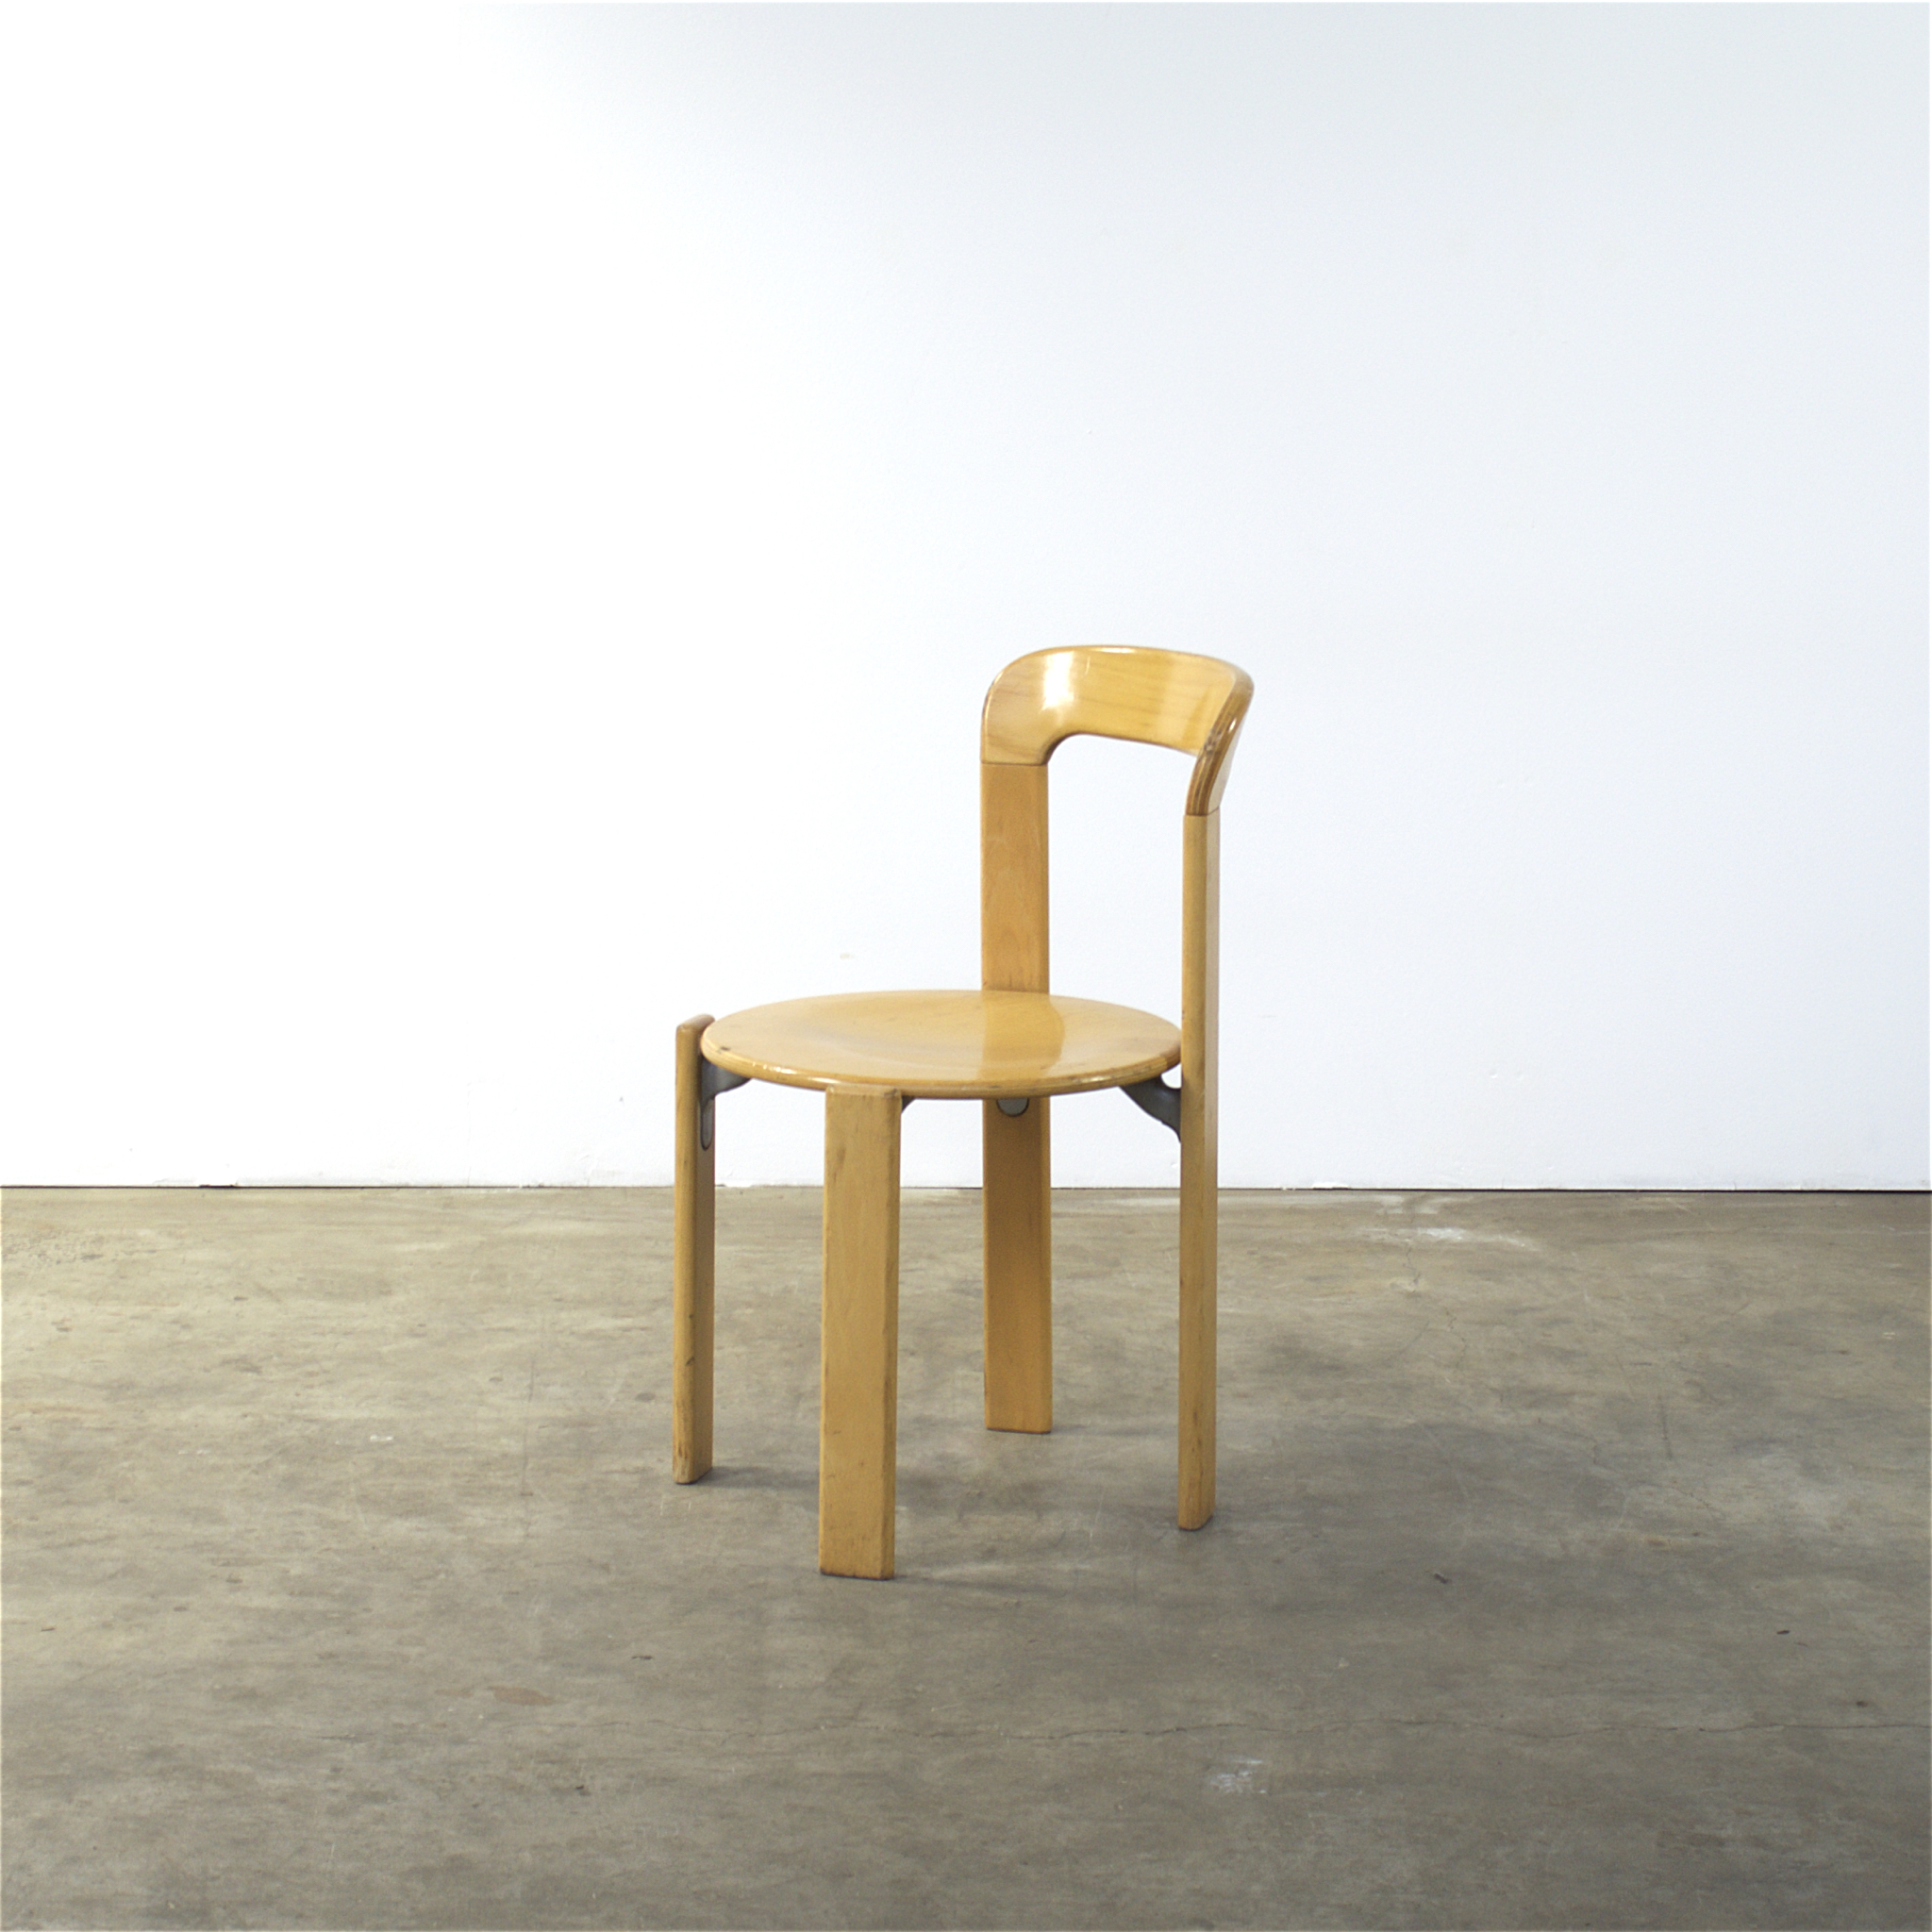 70 s Rey 33 dinner chair by Bruno Rey for Dietiker set 7